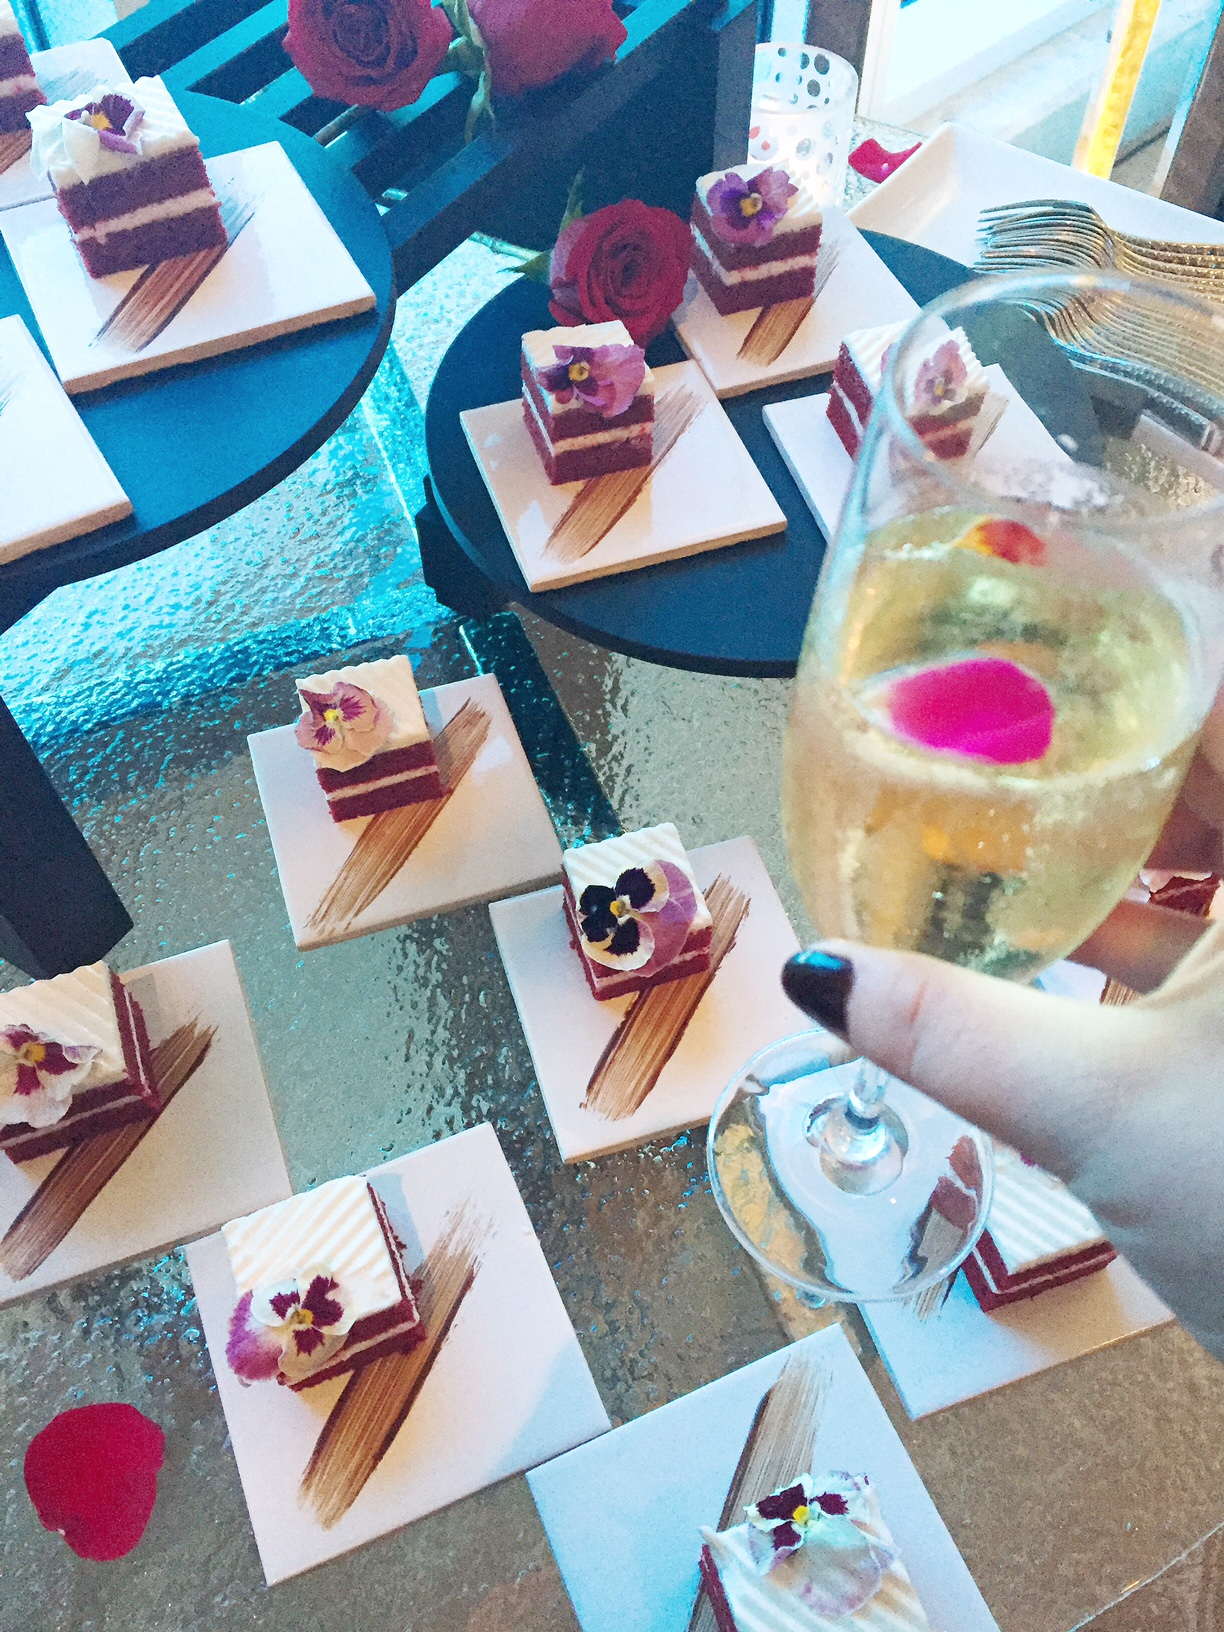 Ritz Carlton Fort Lauderdale Dessert Showcase